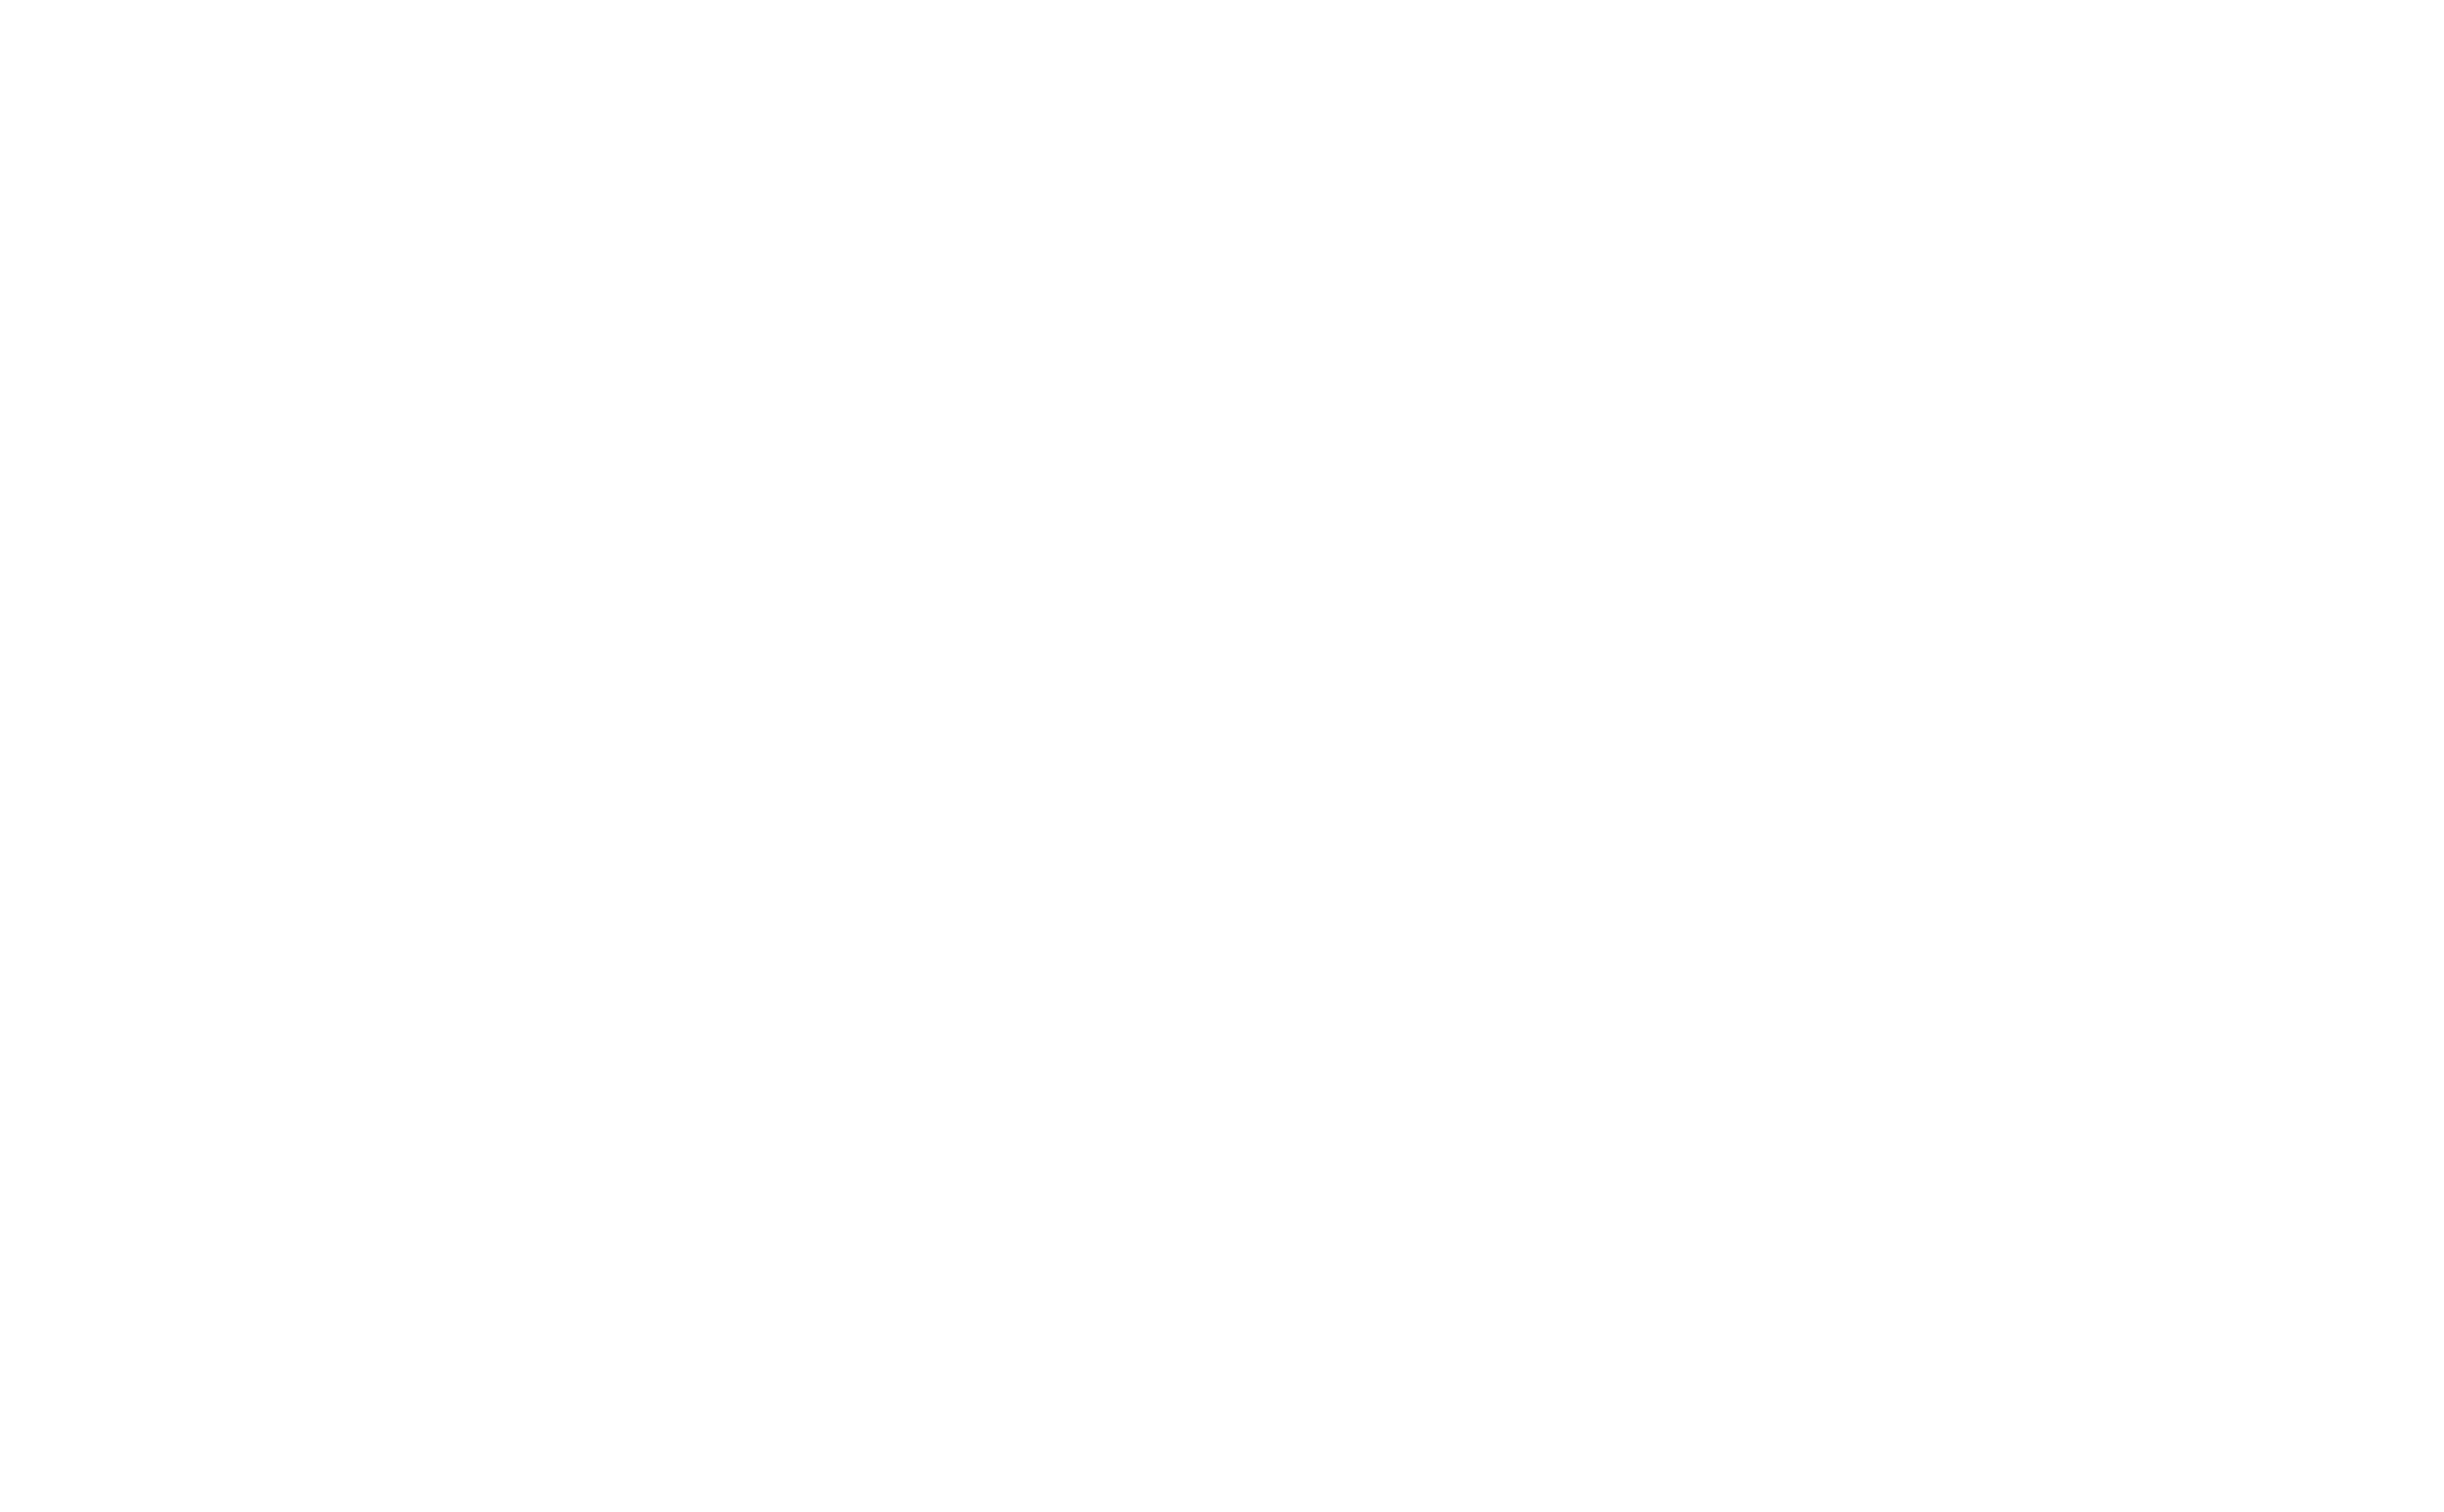 Aize_logo_white_wireframe